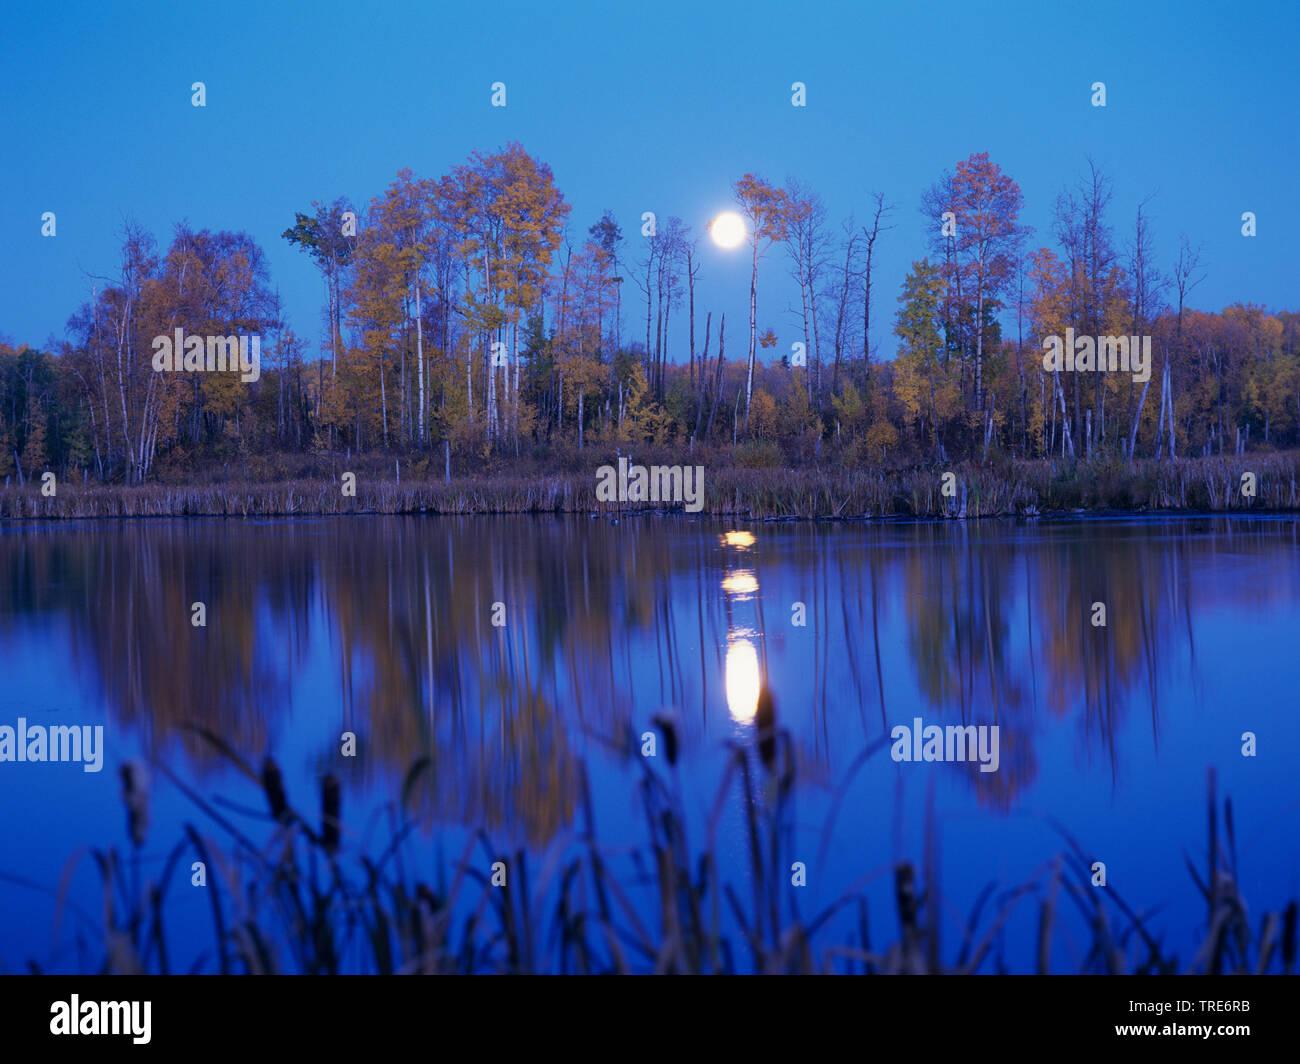 Mondaufgang am See, Deutschland   lake at moonrise , Germany   BLWS518746.jpg [ (c) blickwinkel/W. Layer Tel. +49 (0)2302-2793220, E-mail: info@blickw - Stock Image